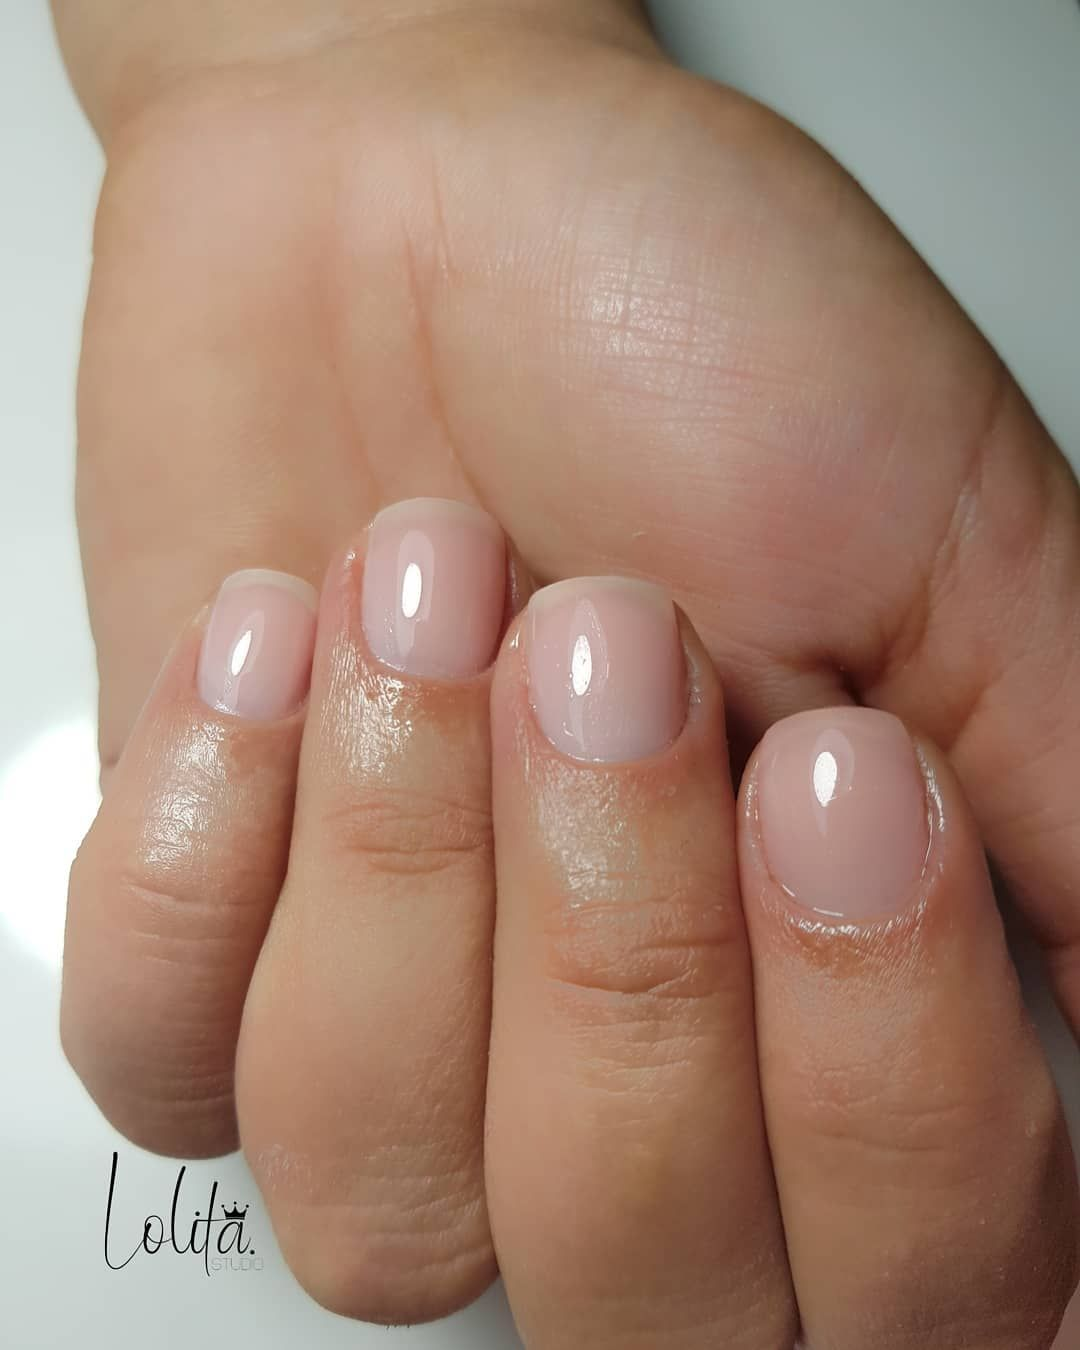 Natural Look Arty Nails Polygel Reforma Top Glide Gelpolish Gellak Trajnilak Gelnails Gelnokti Gel Nokti Lovemyjob Lovenails Nailpro N Gelnails